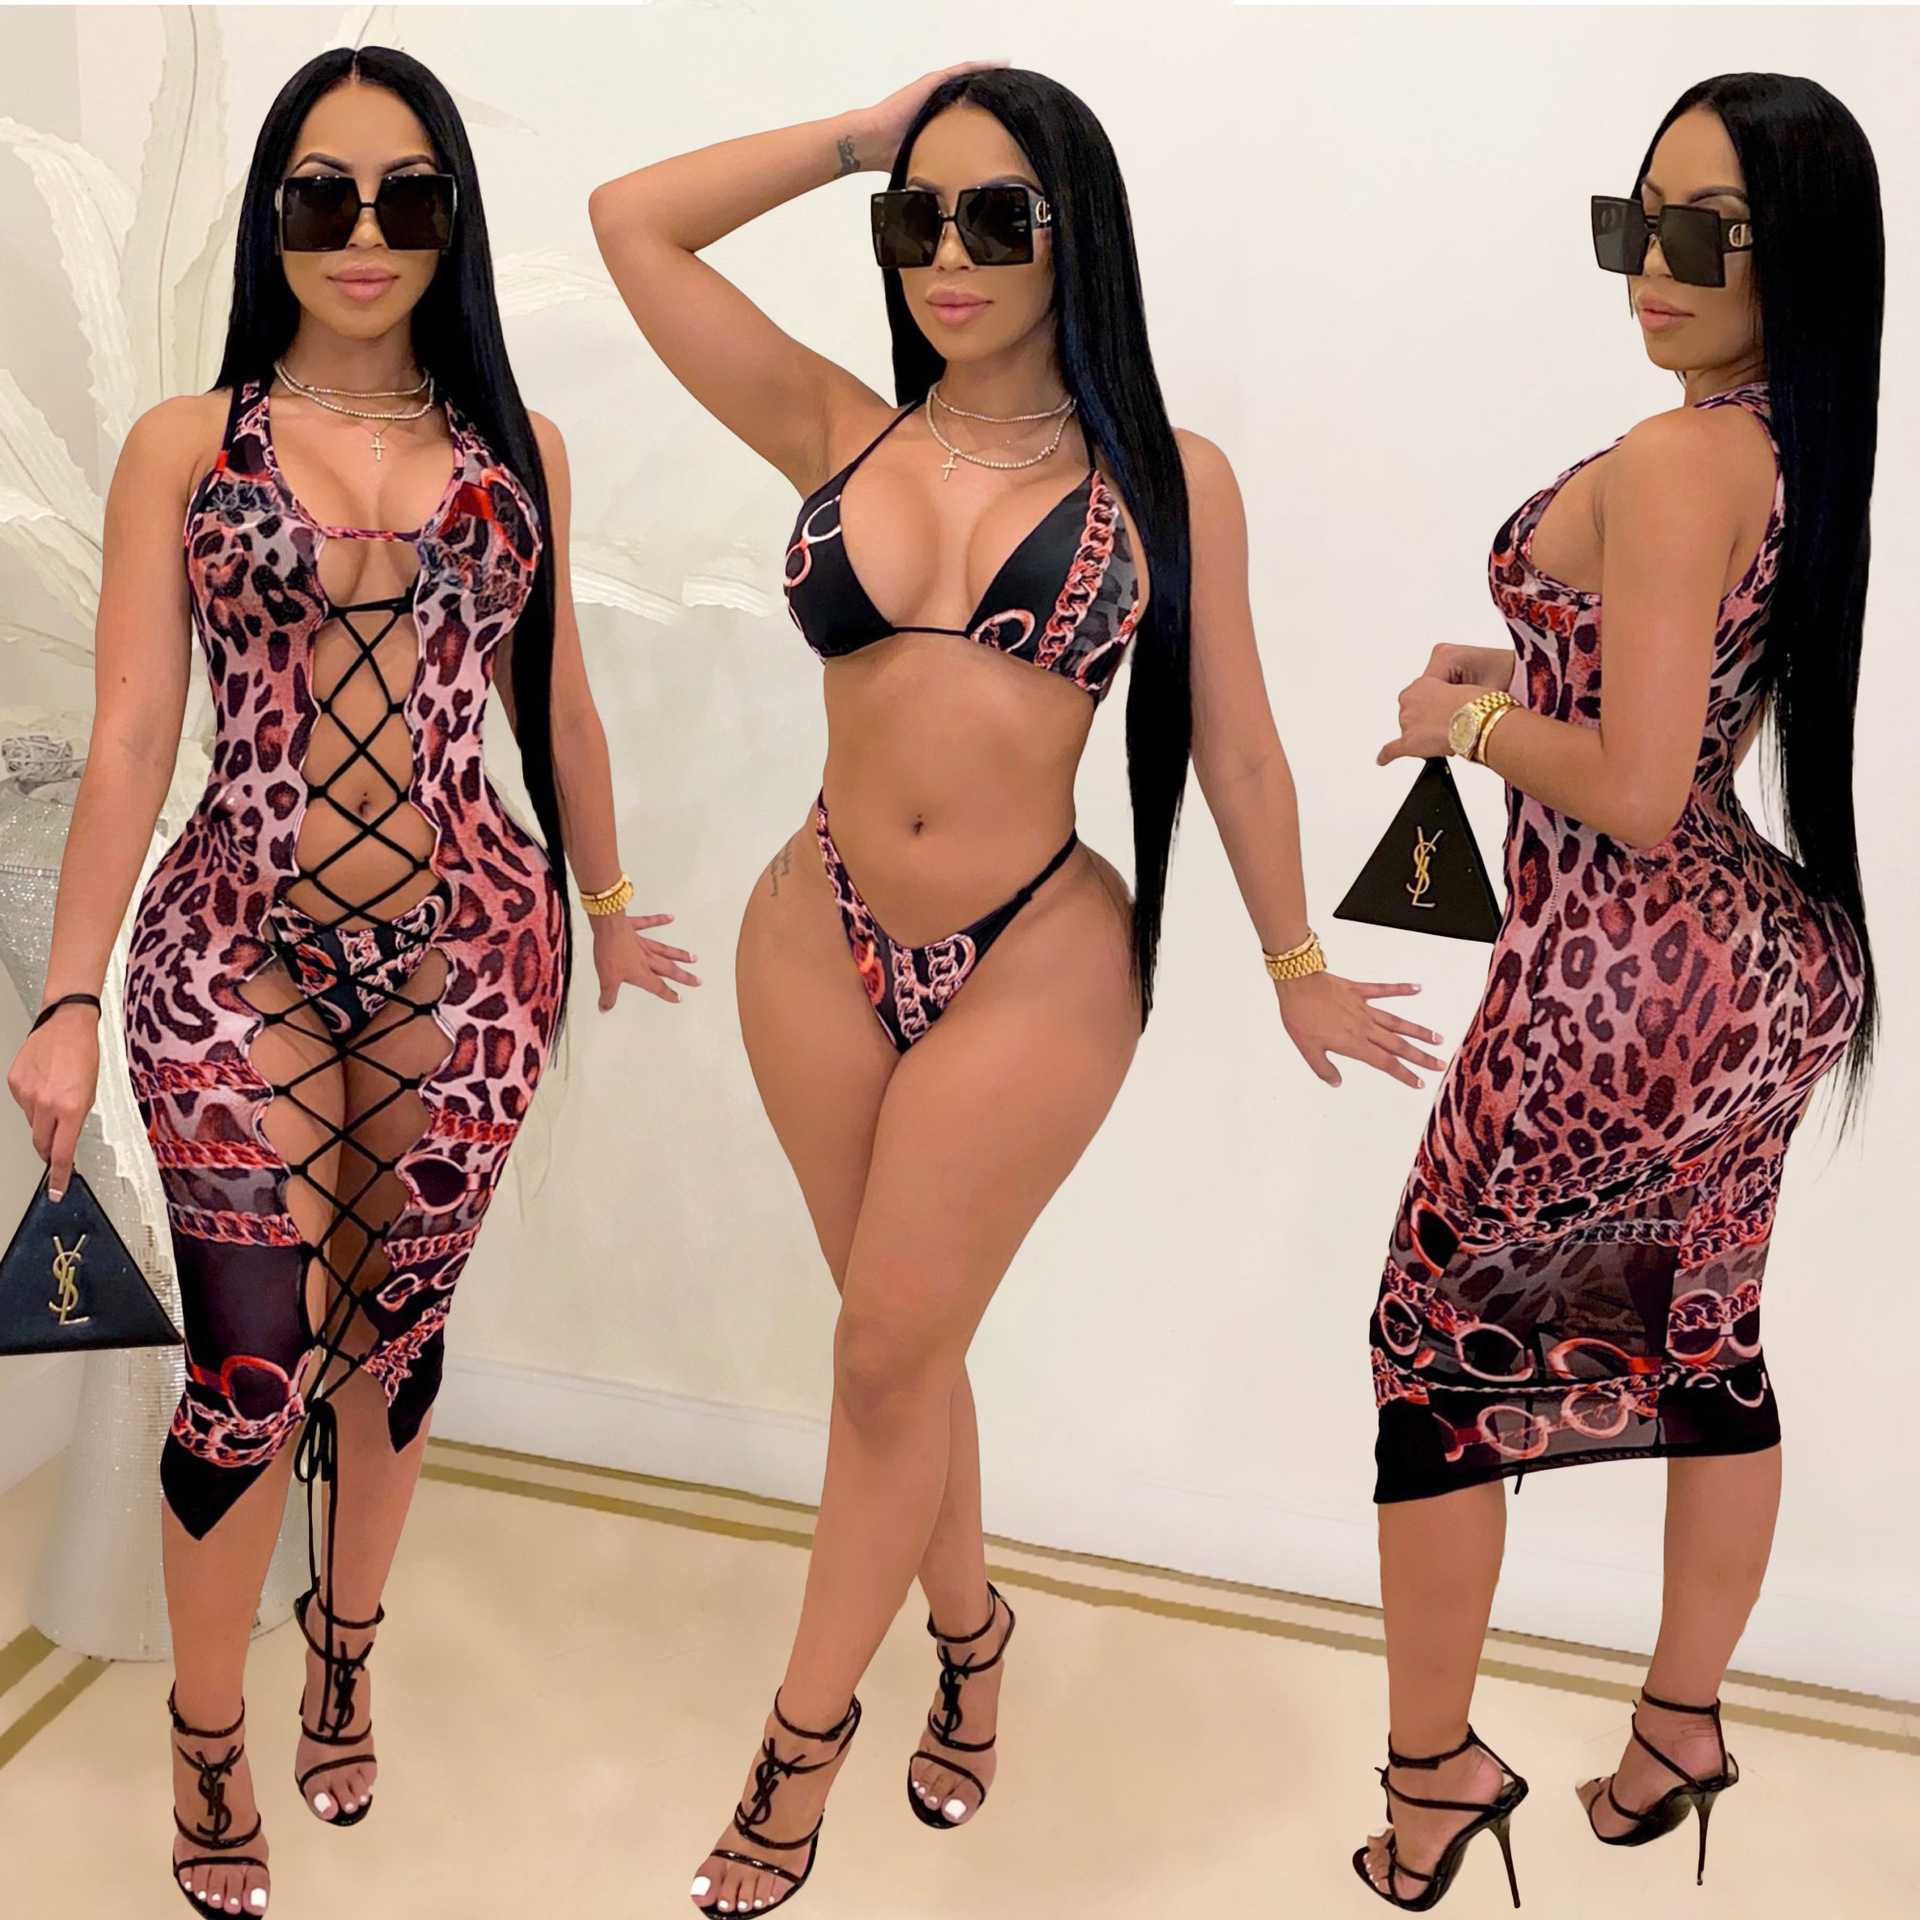 2021 Fashion Bikini Set And Matching Cover Dress Womens Sleeveless Hollow Out Laced Beach Dress 3 Pieces Outfits Beachwear S-XL 7